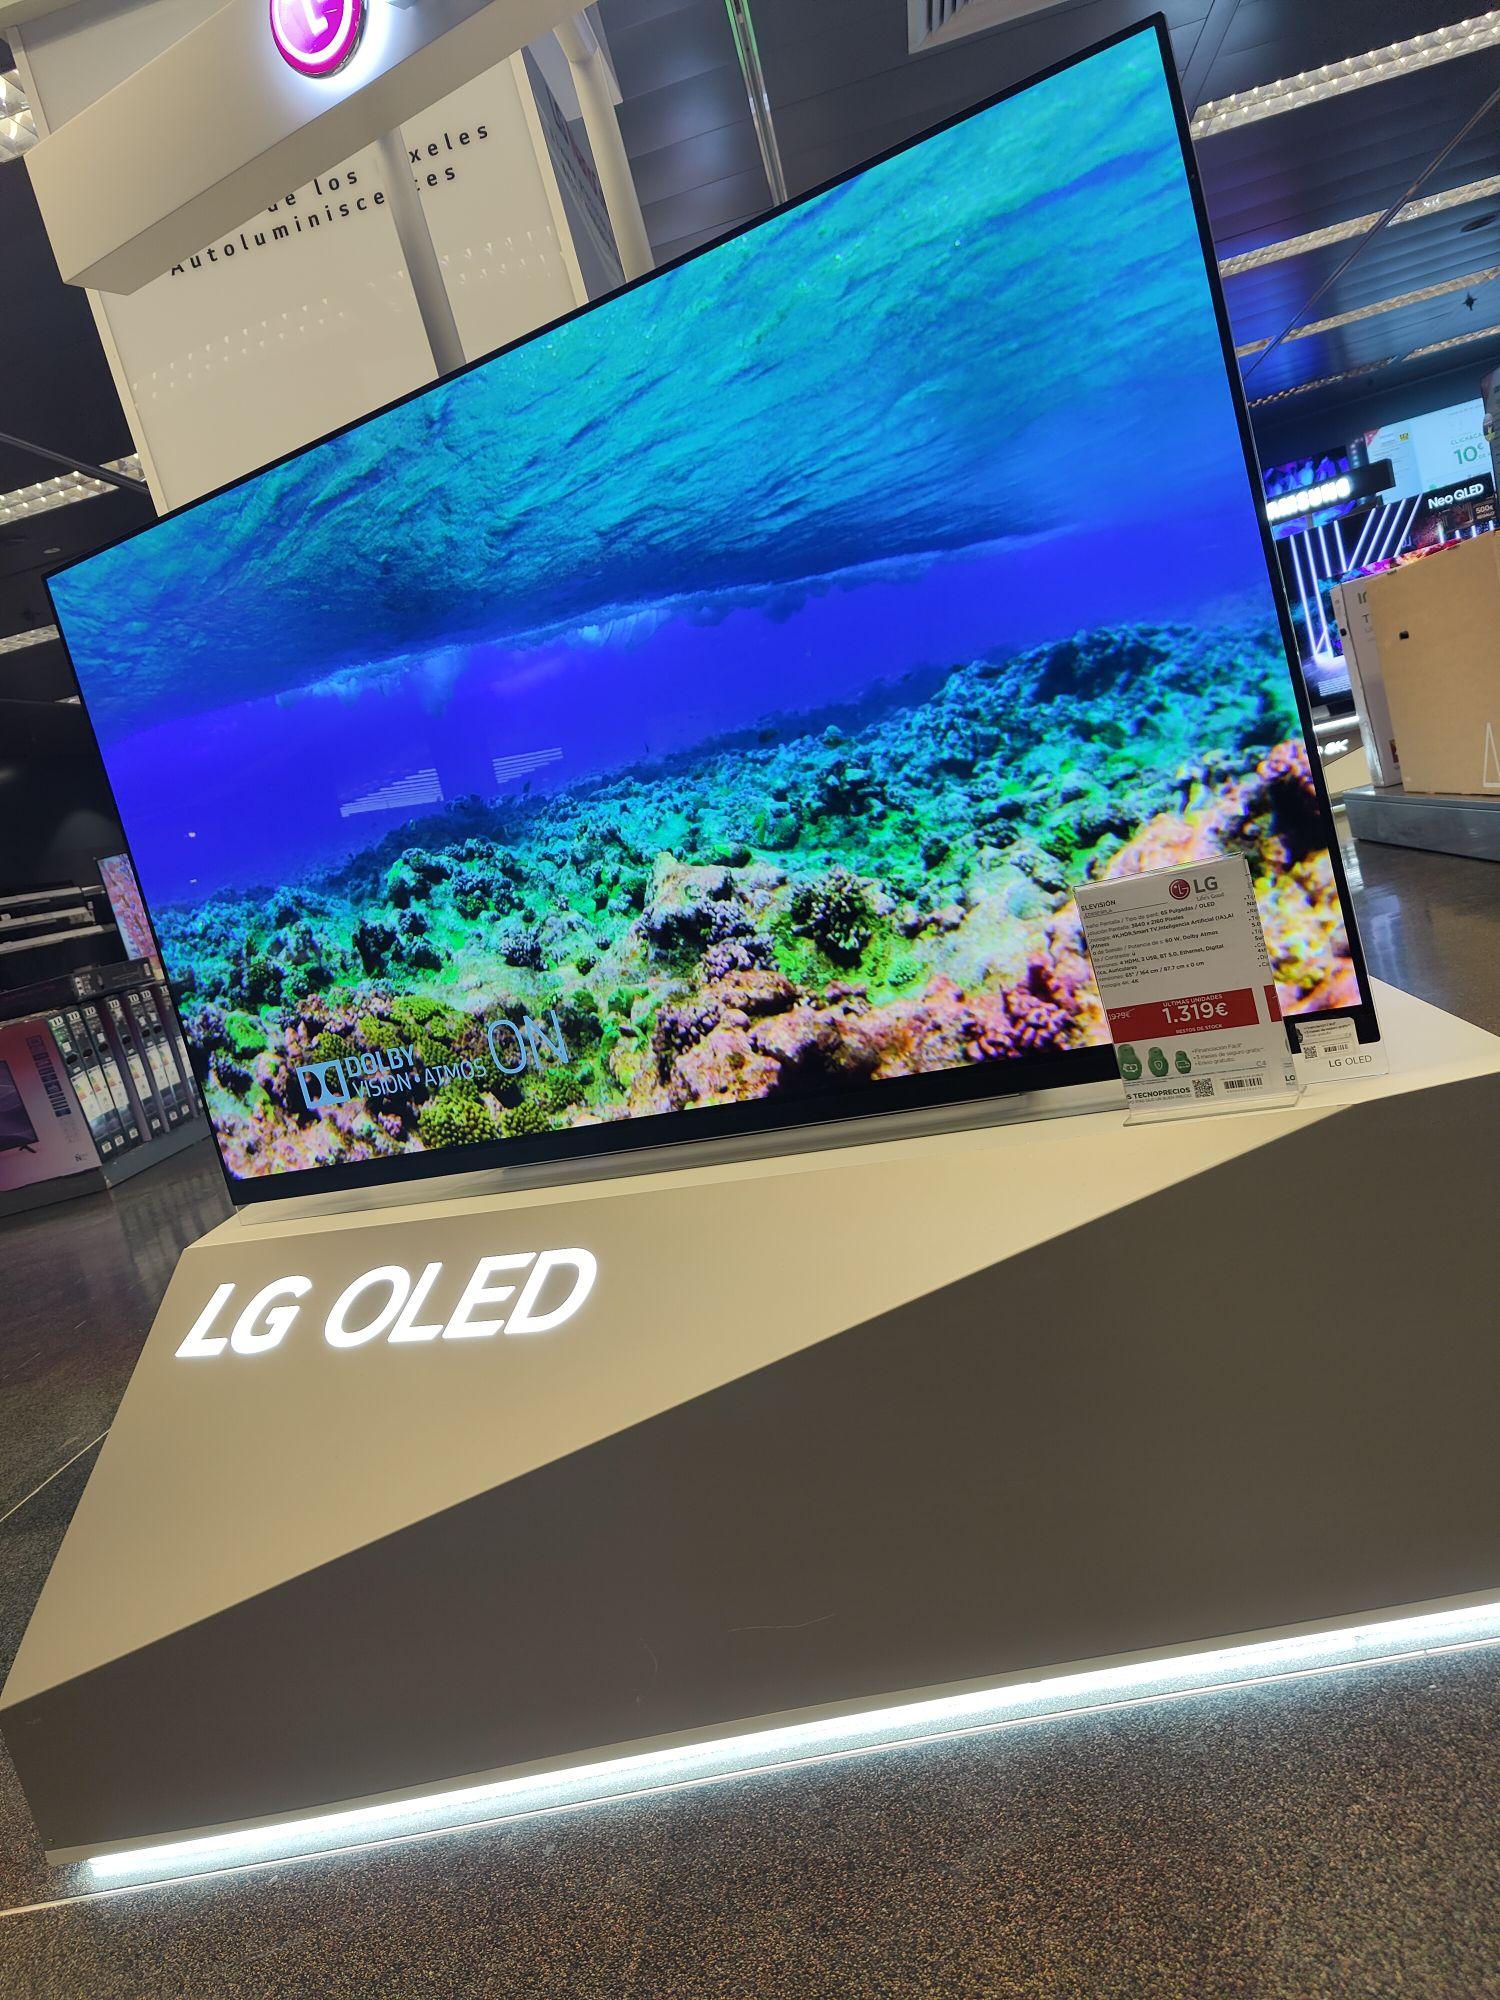 Tienda el corte inglés Granada LG OLED TV 4K, 164cm/65''